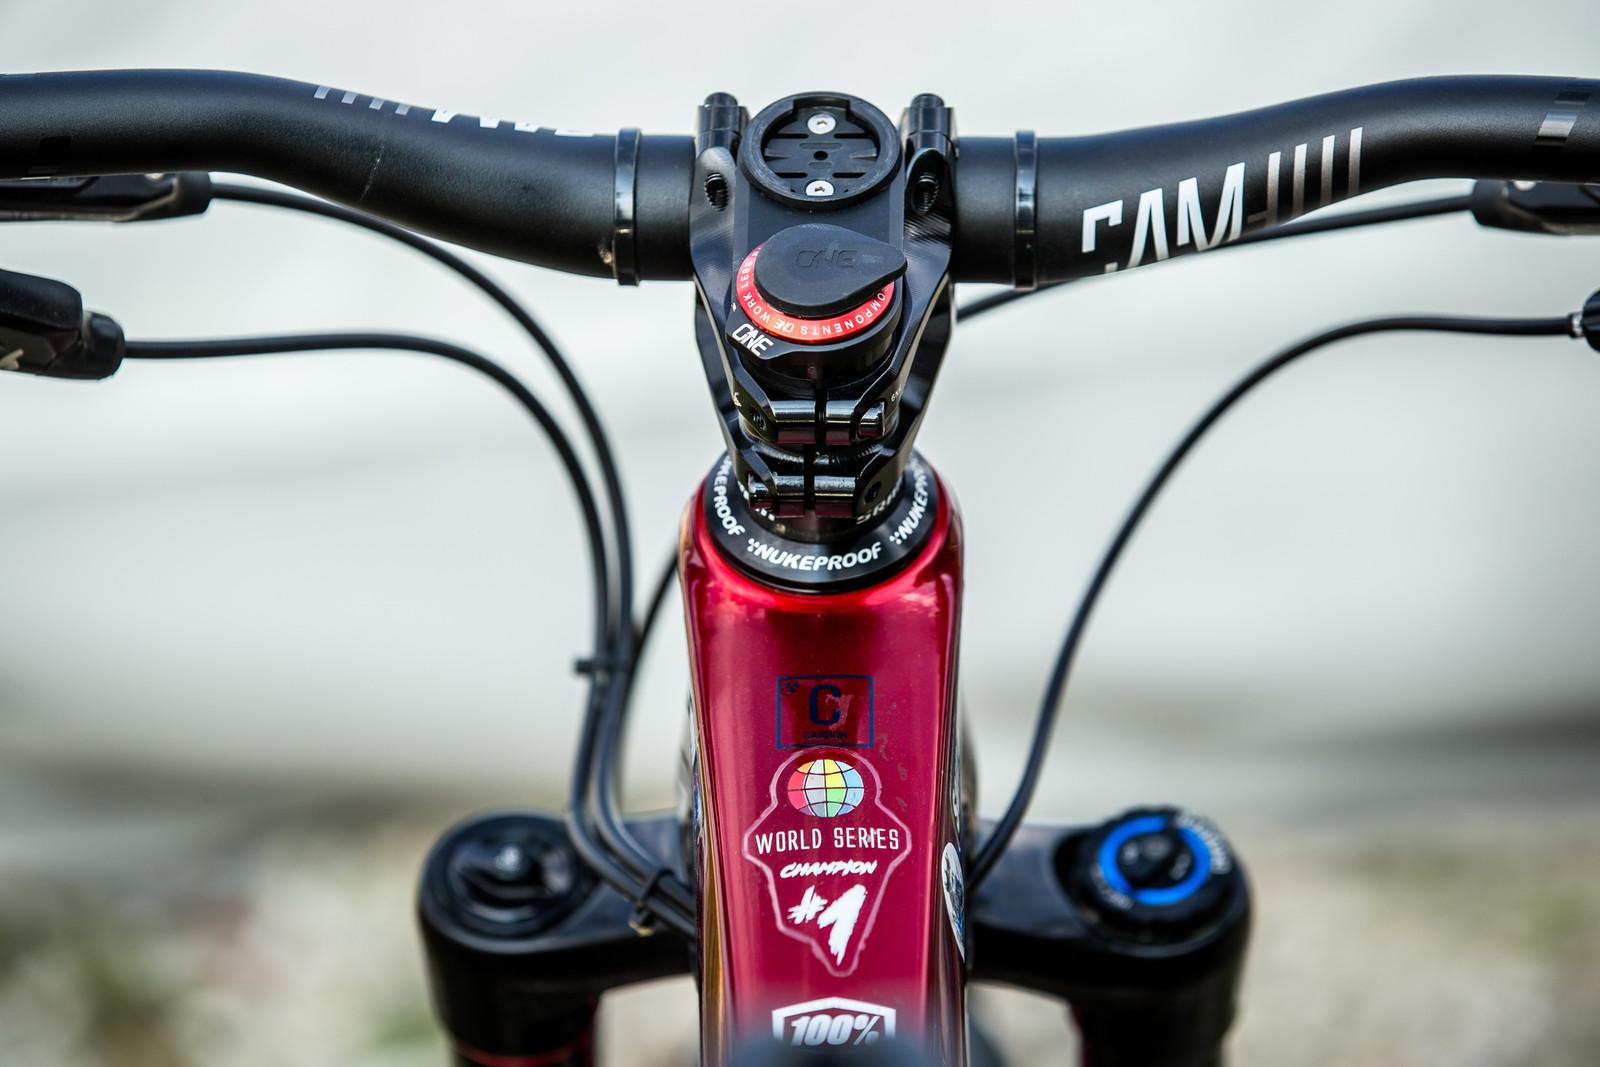 OneUp Components Stash Tool - WINNING BIKE - Sam Hill's Nukeproof Mega 275 - Mountain Biking Pictures - Vital MTB